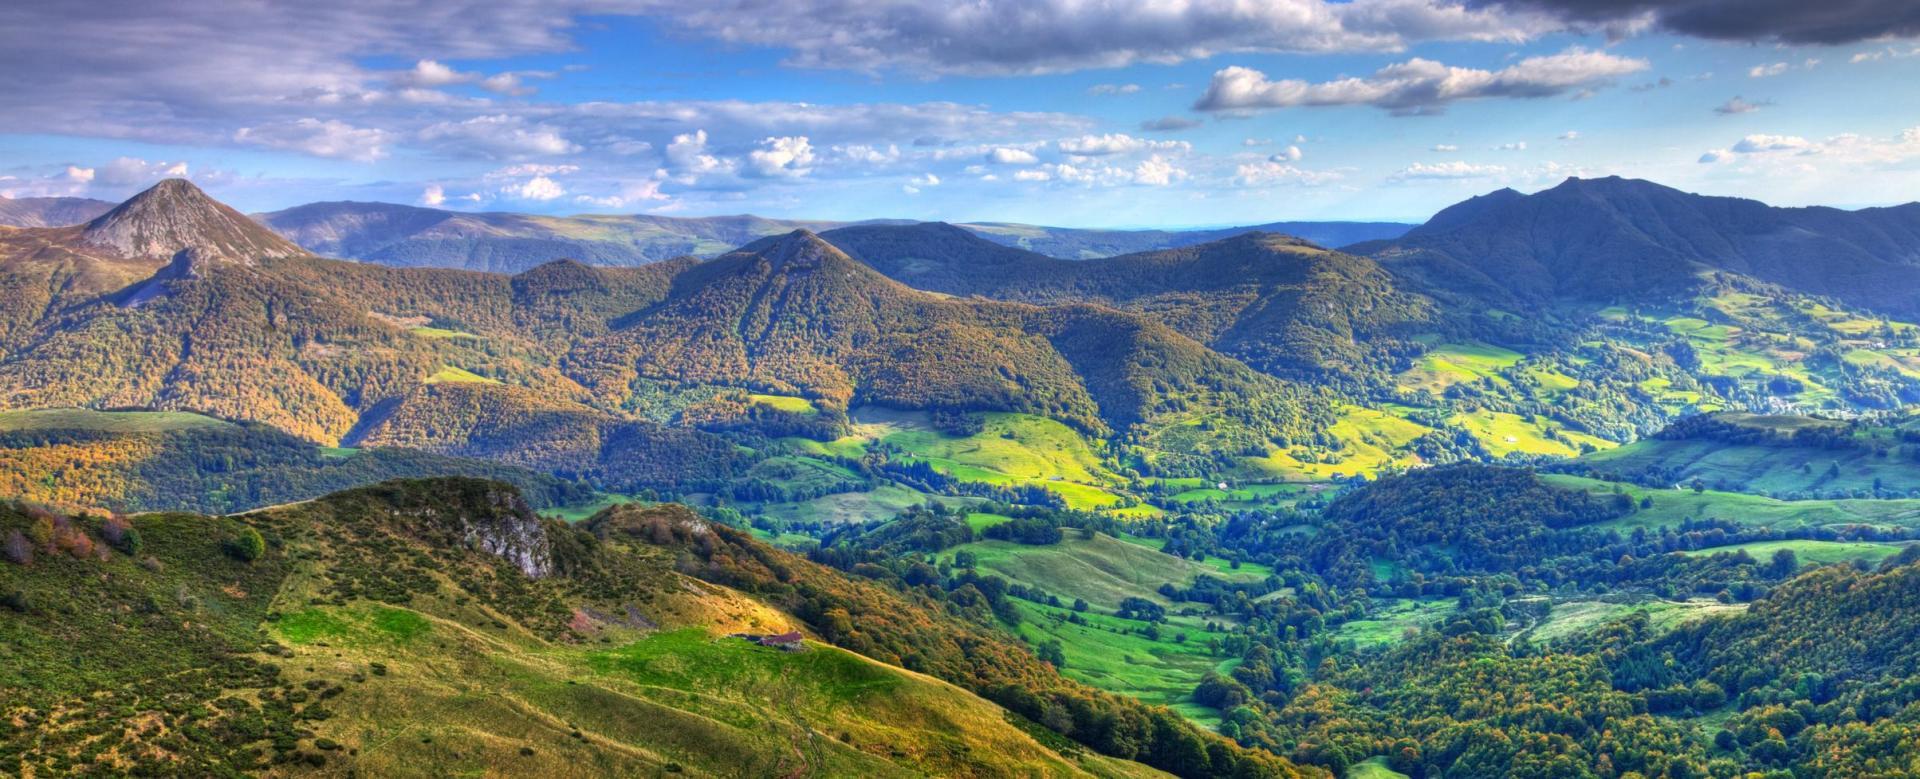 Voyage à pied : Cantal : le plus grand volcan d'europe